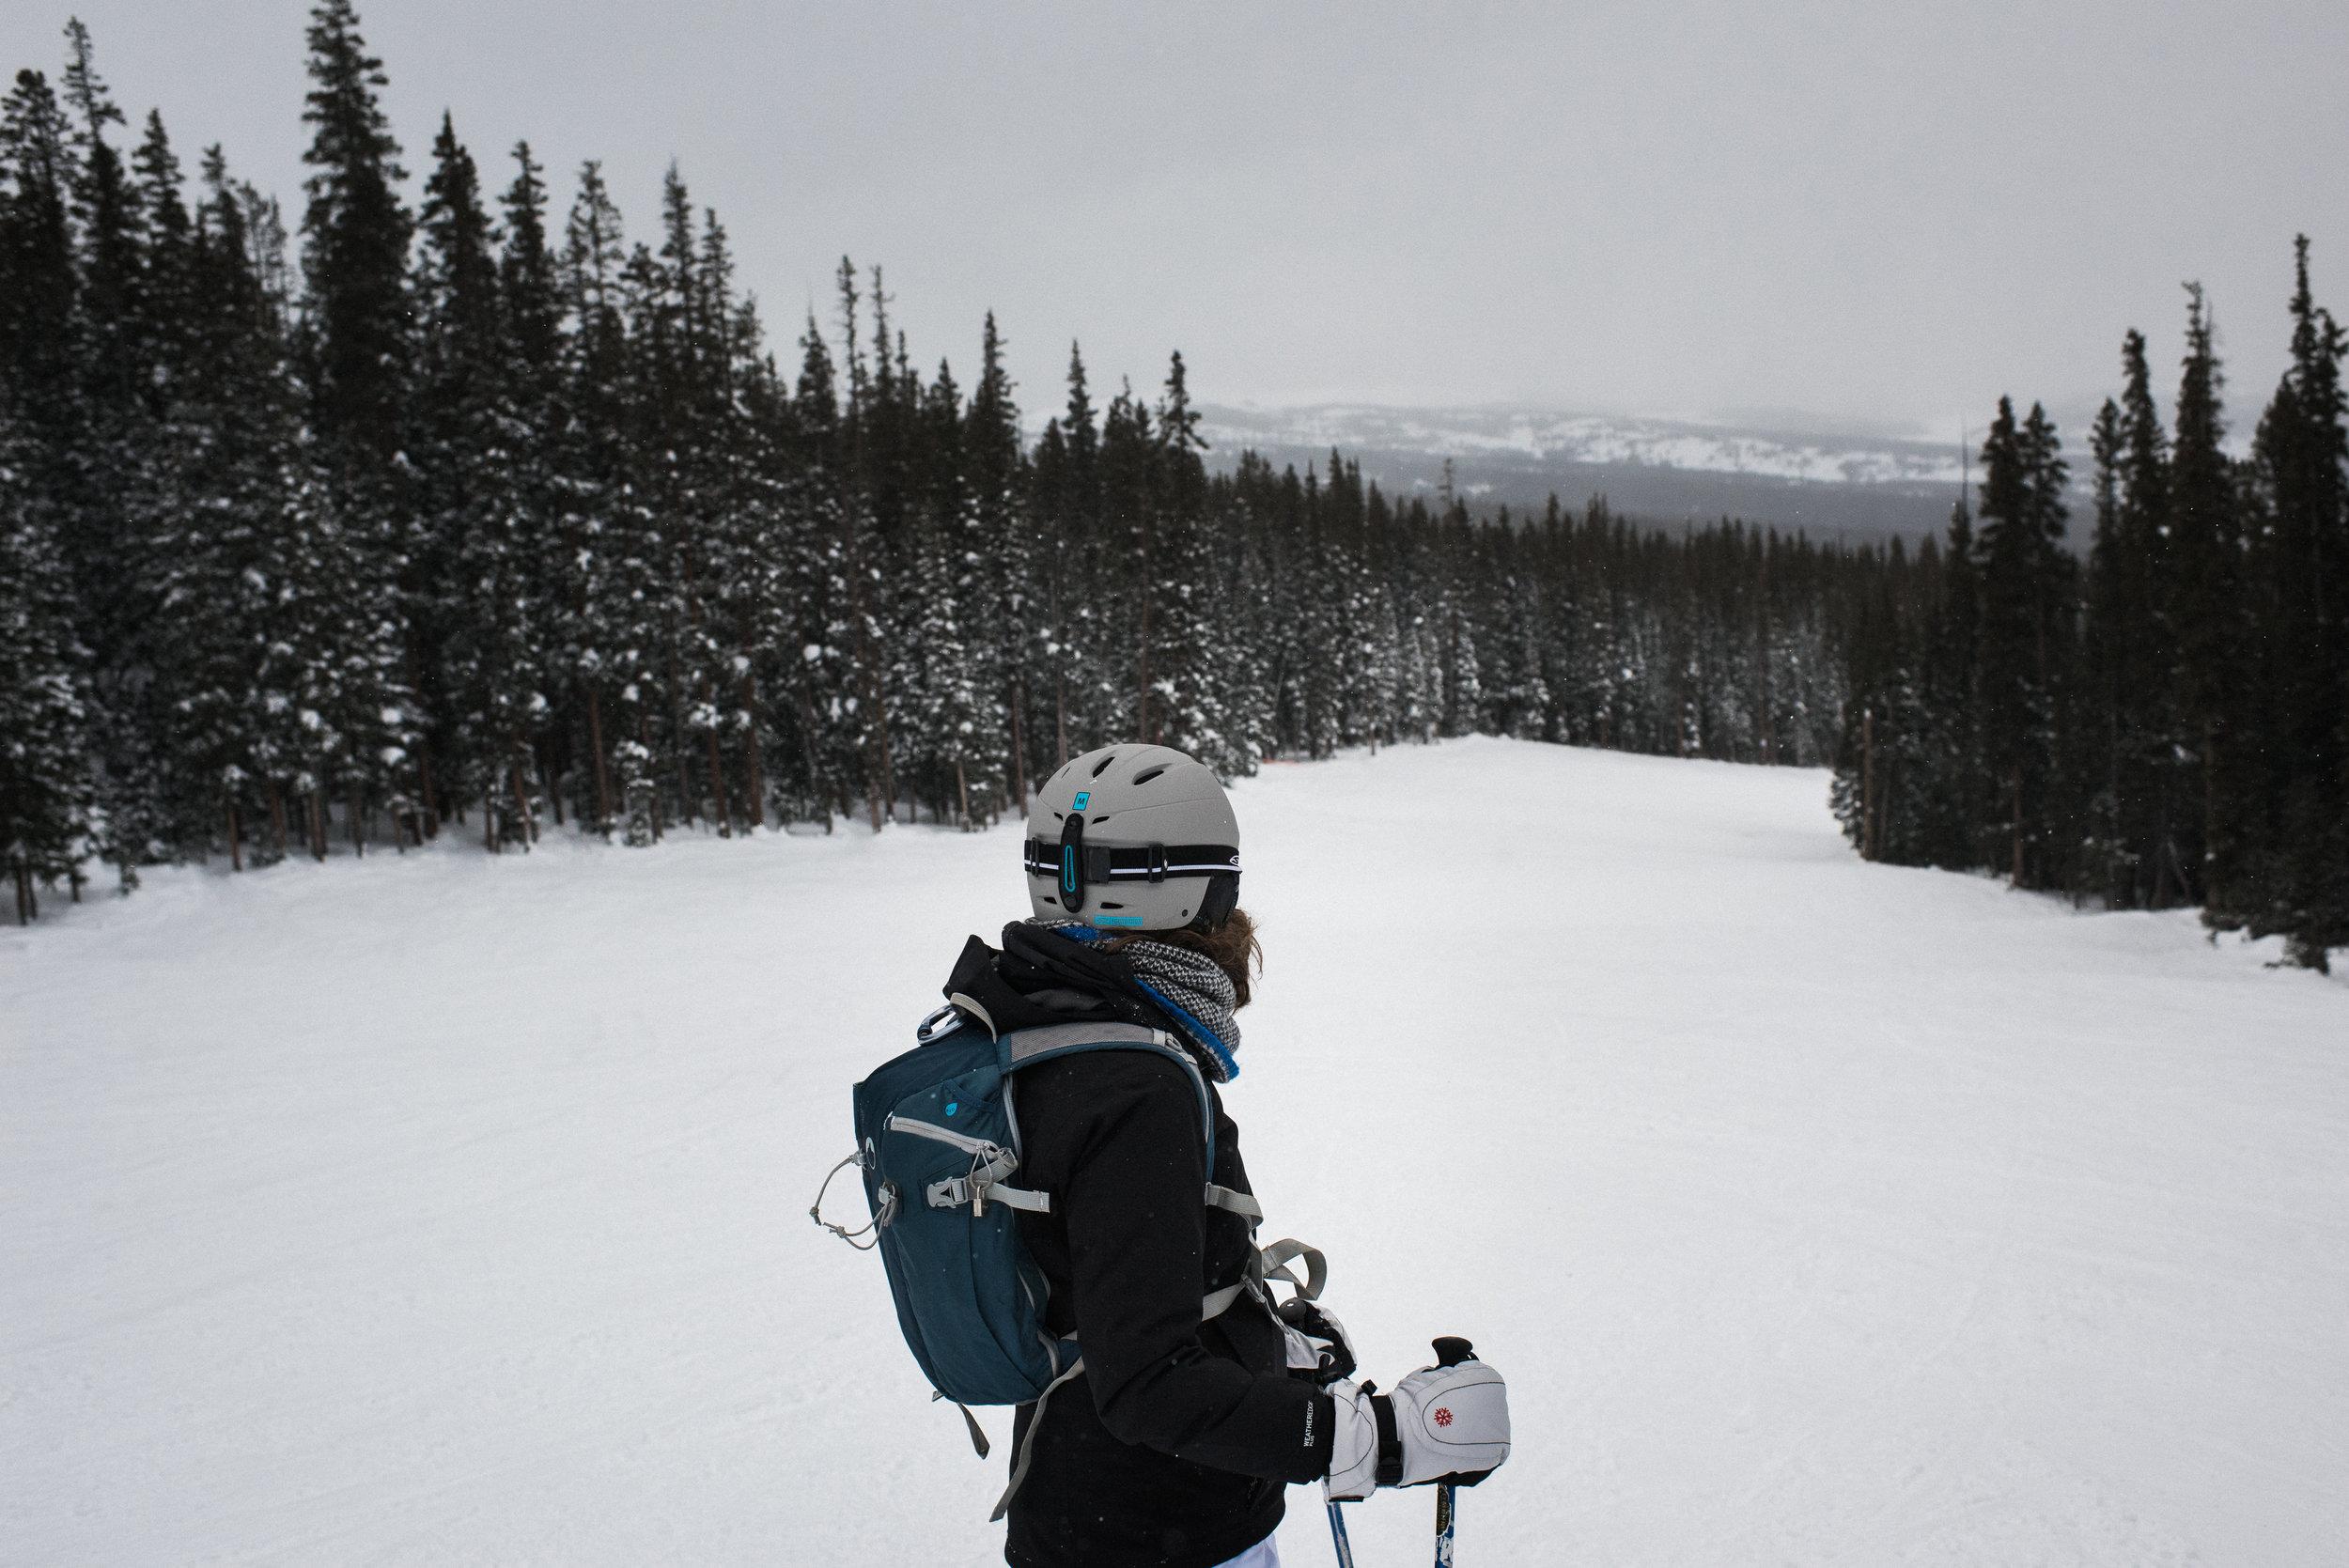 TaraShupe_Outdoor_Photographer_Loweprobags_Colorado_Copper_Mountains_Ski_25.jpg